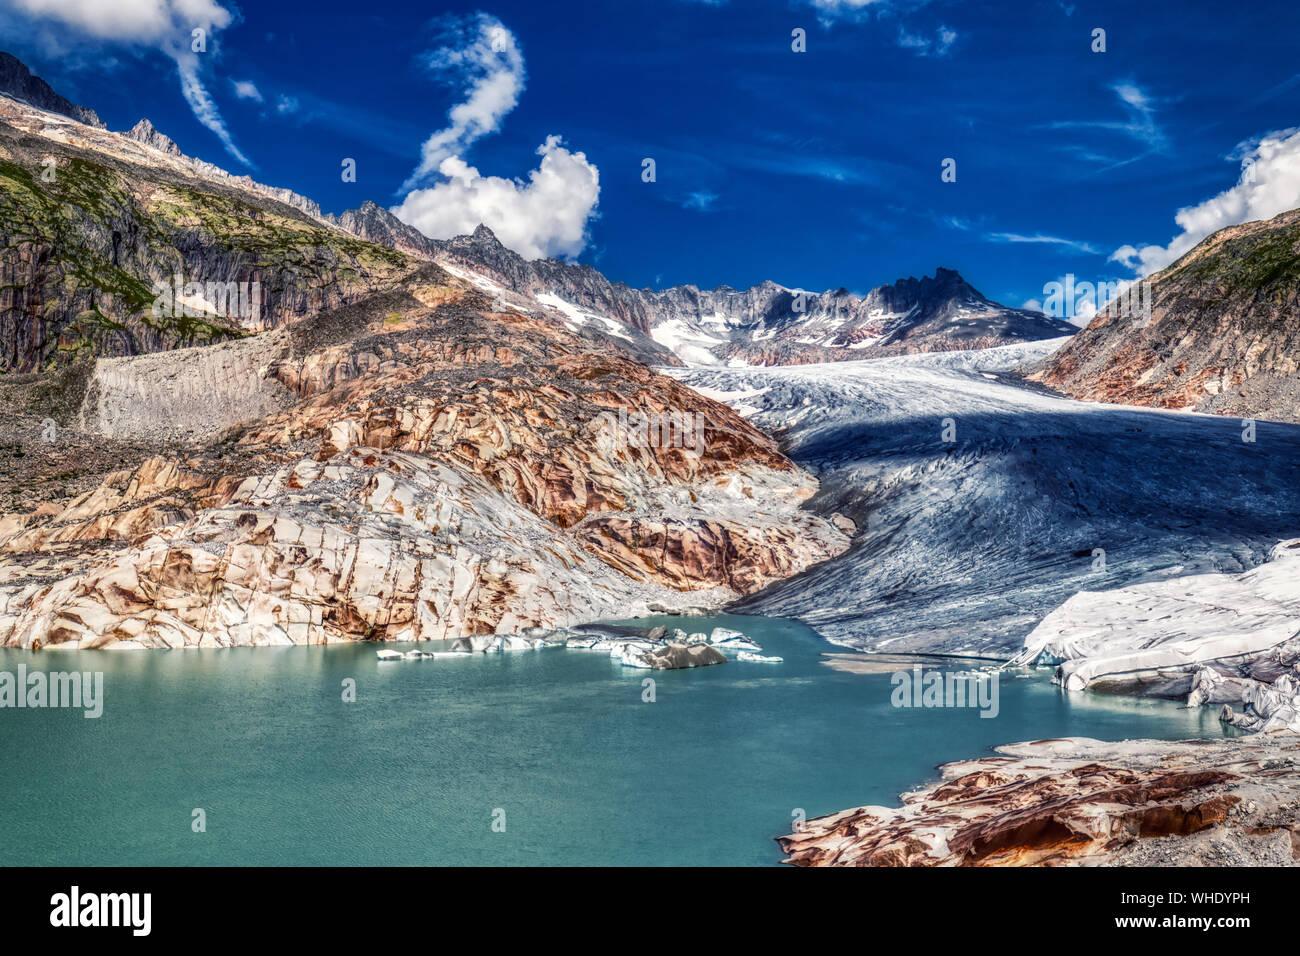 panorama of melting rhone glacier in swiss alps, switzerland Stock Photo